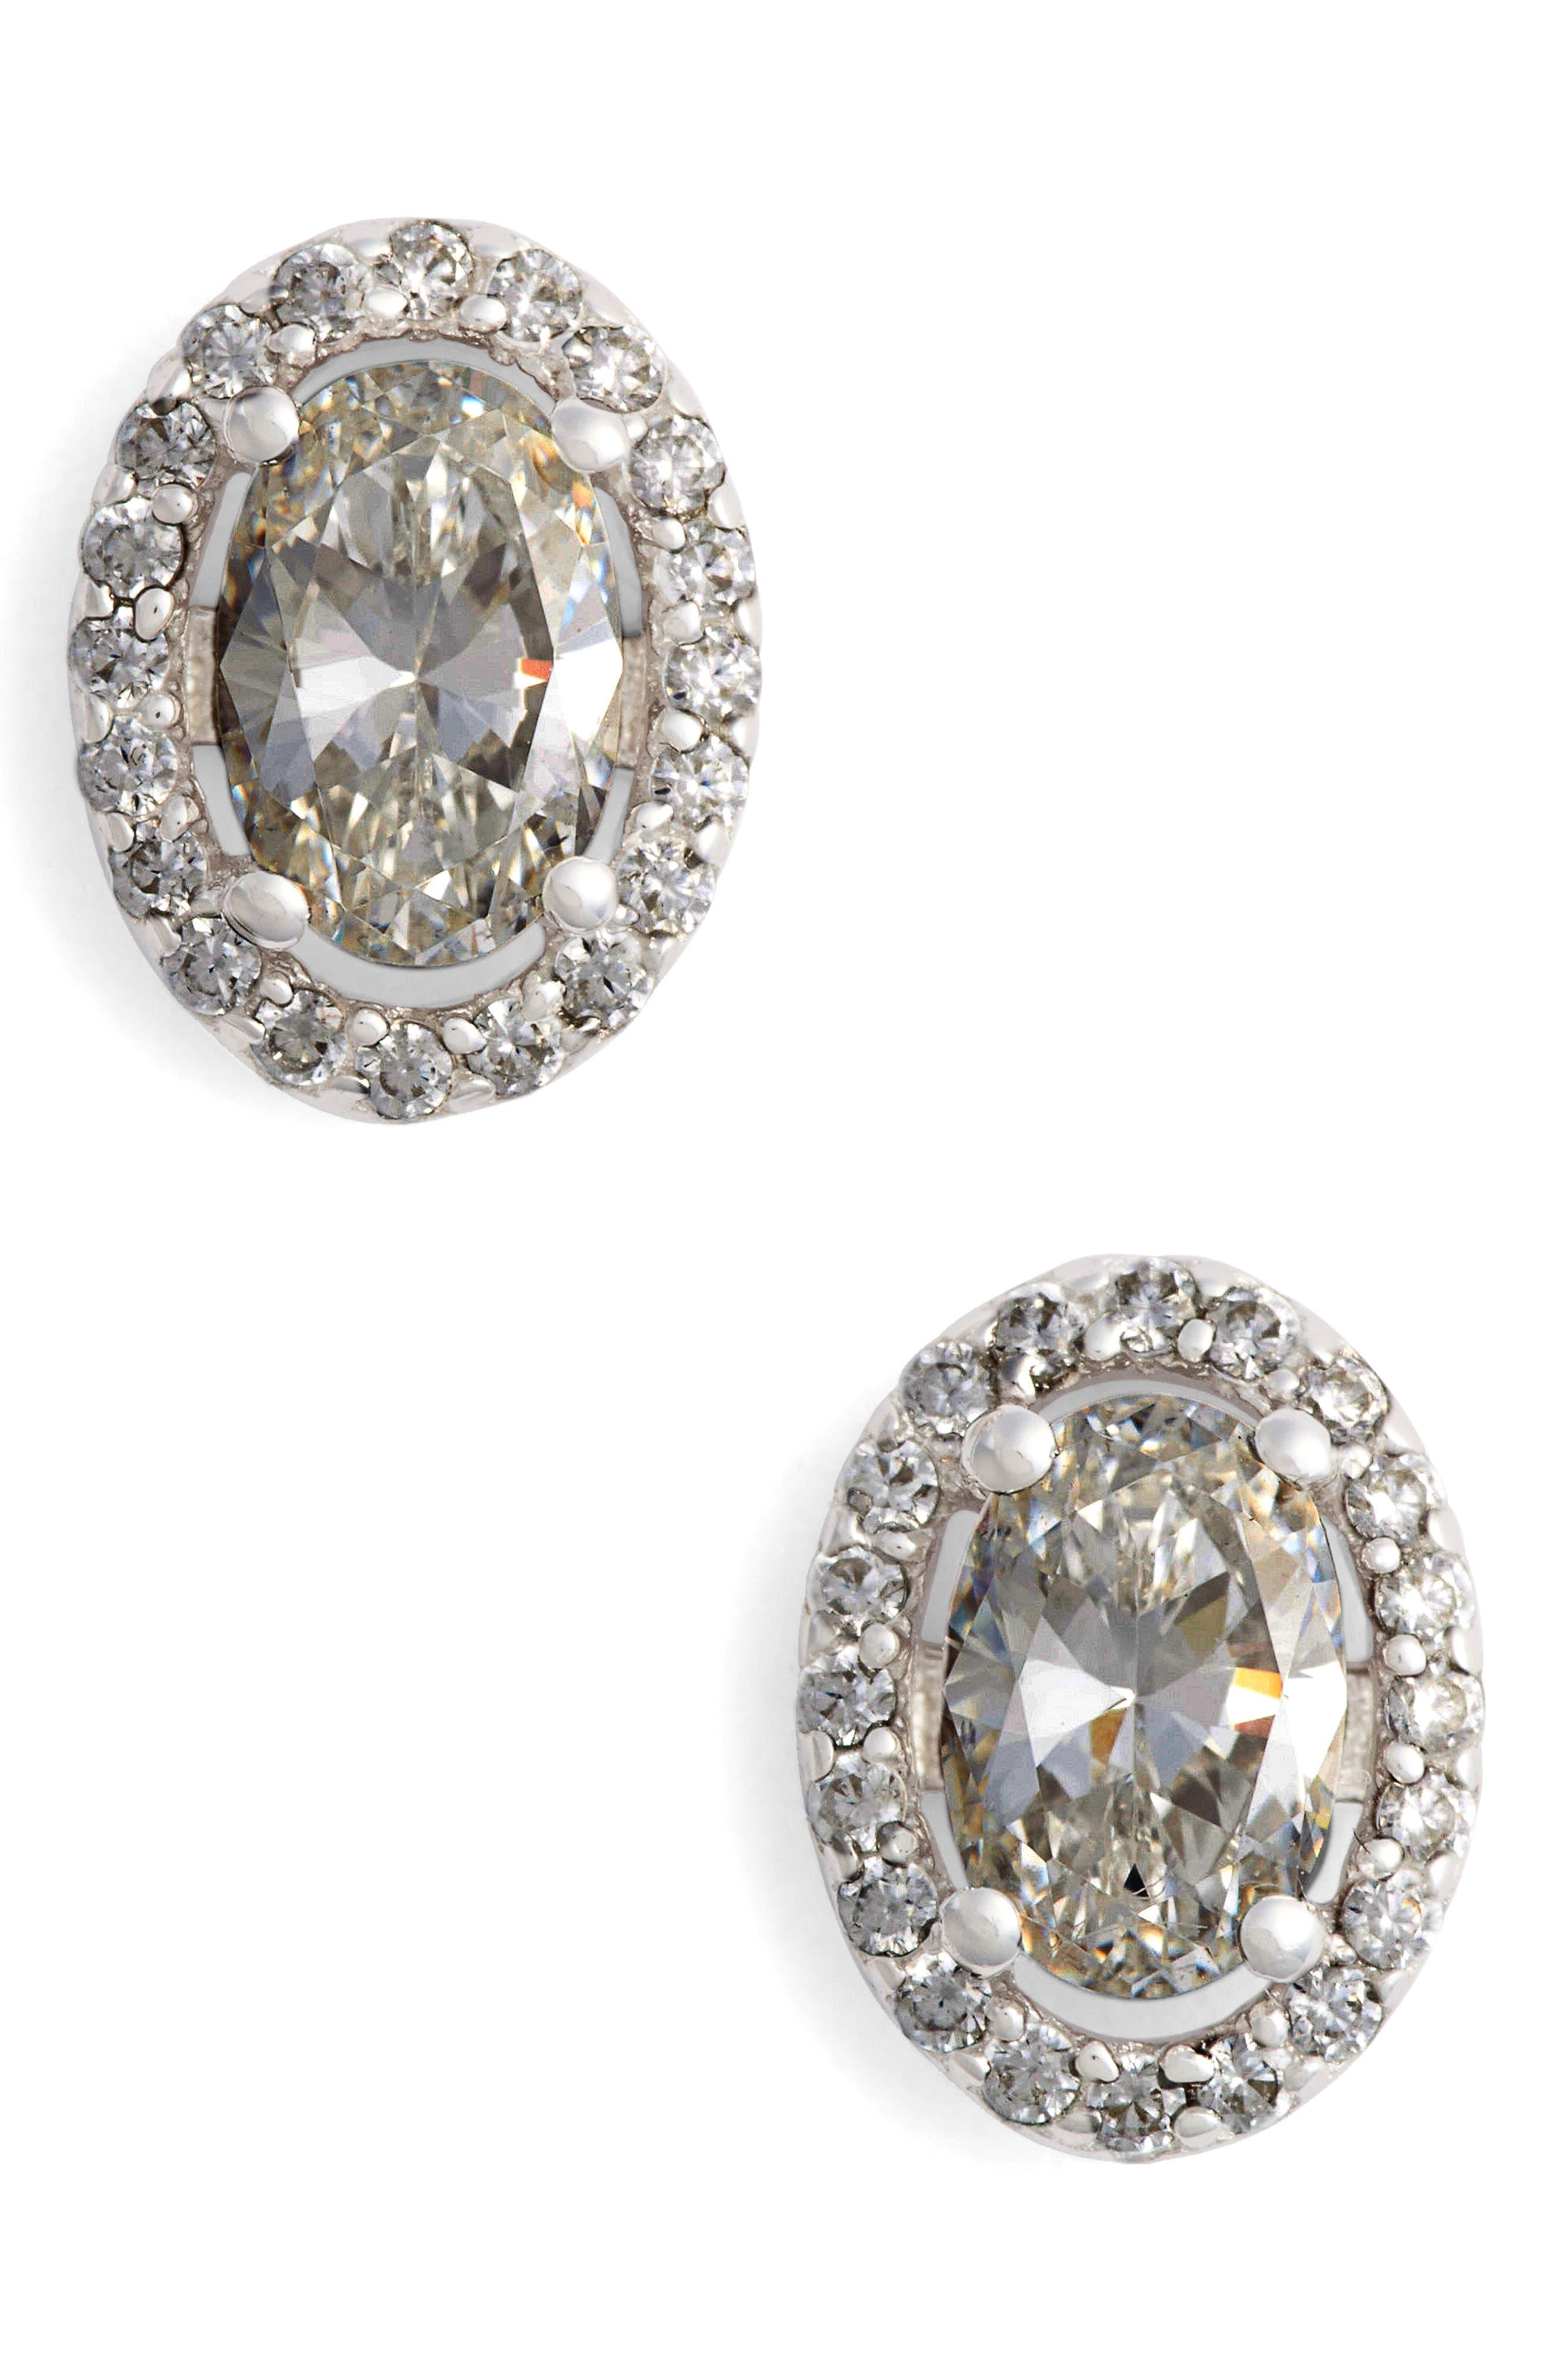 Simulated Diamond Stud Earrings,                             Main thumbnail 1, color,                             Silver/ Clear